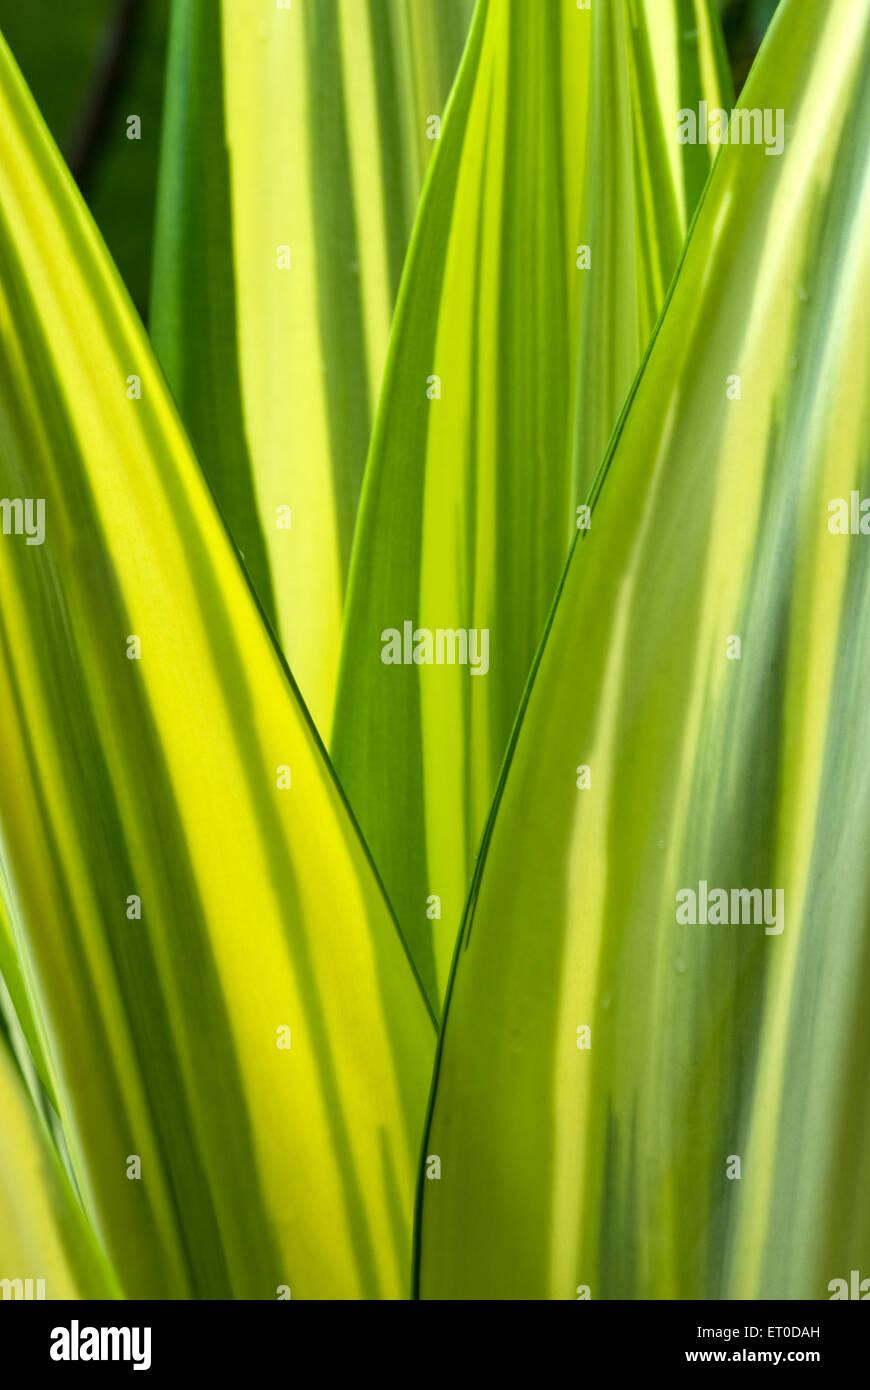 Foglie di agave frondose piante succulente ; Coimbatore ; Tamil Nadu ; India Immagini Stock